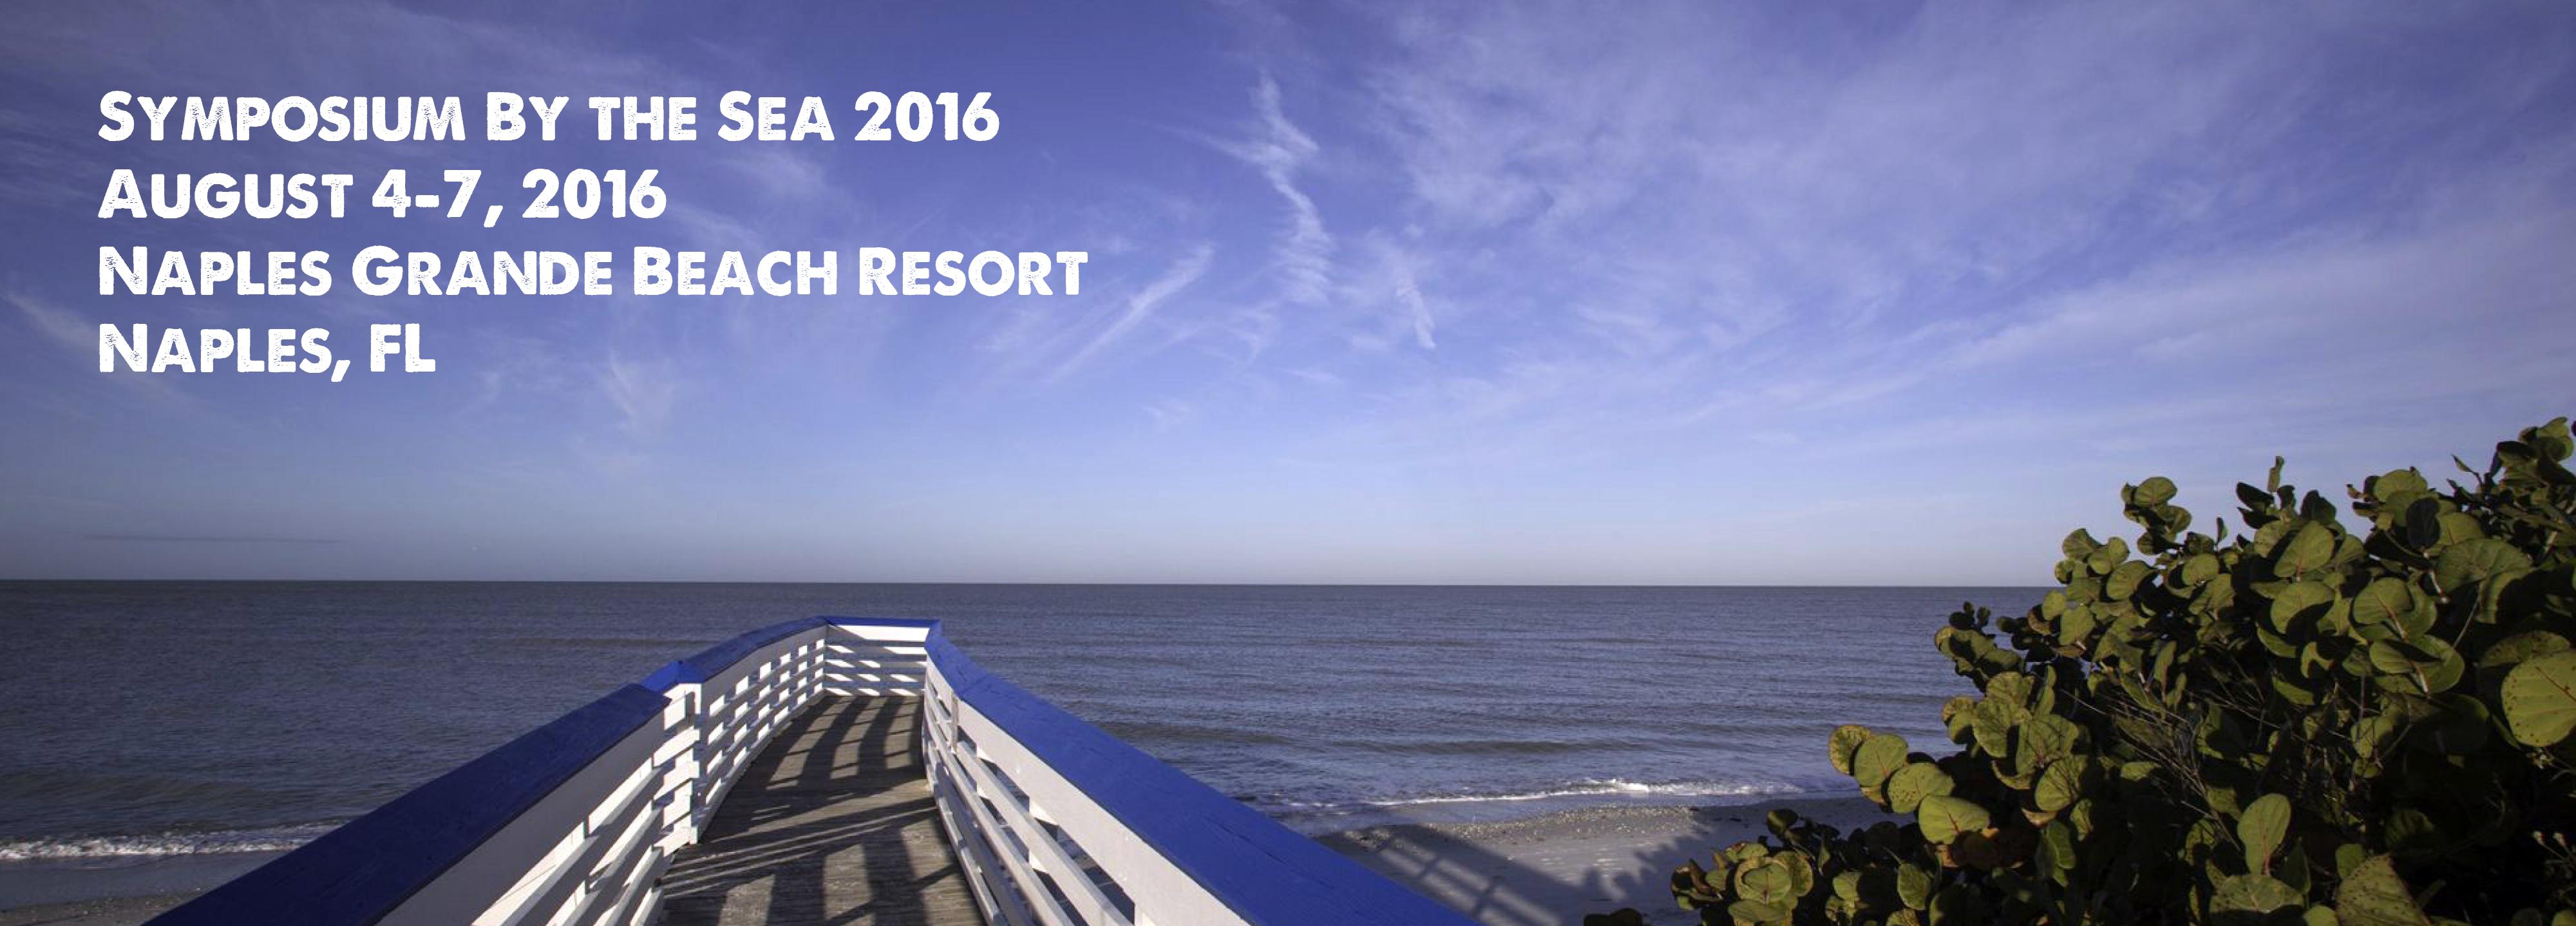 Symposium by the Sea 2016